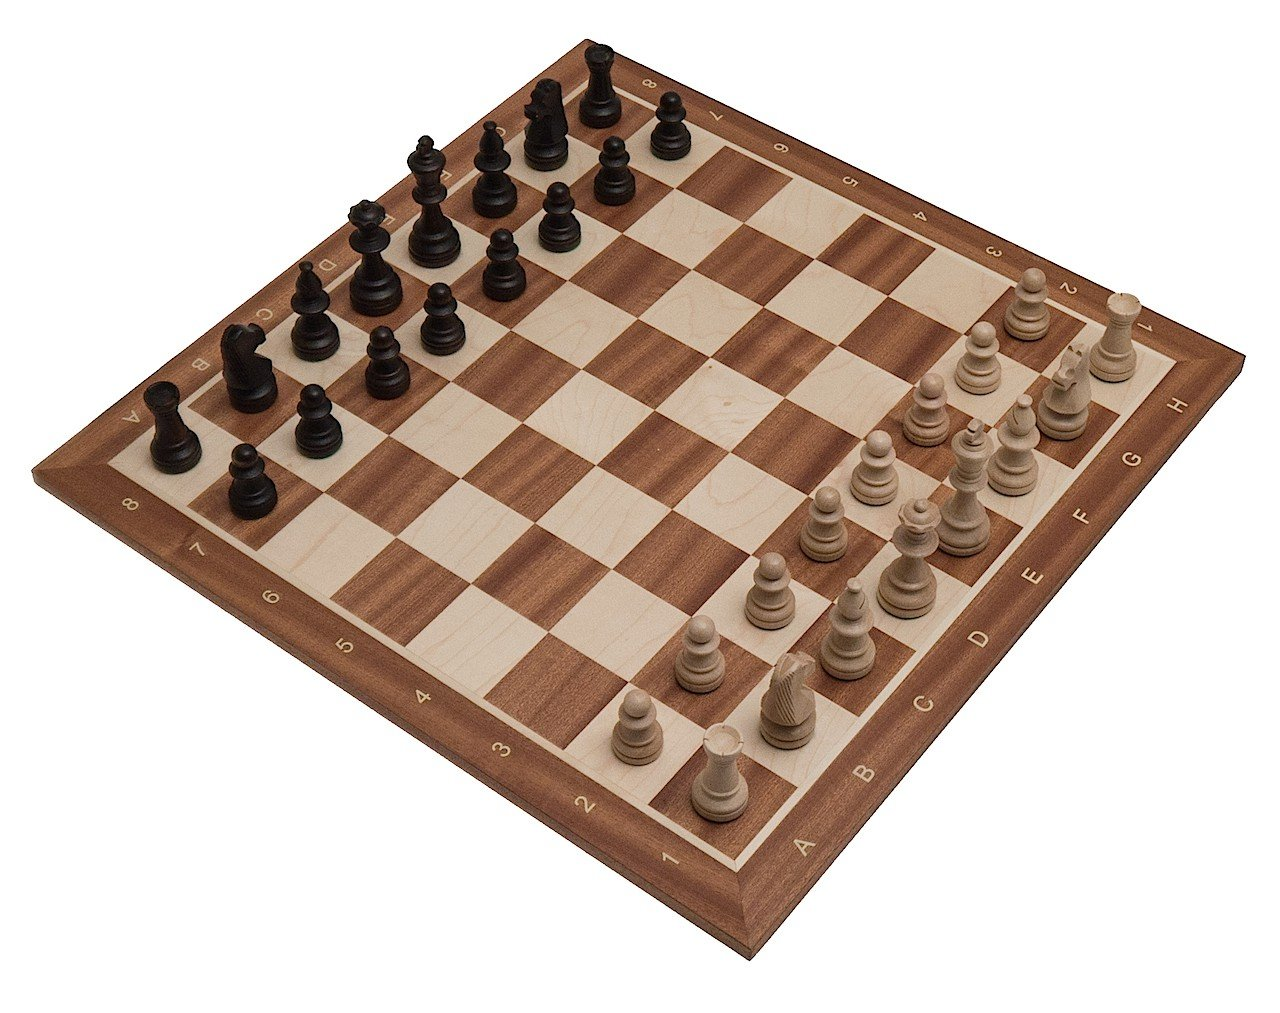 Schachset, Schachset kaufen, Schachset Test, gutes Schachset, bestes Schachset, günstiges Schachset, Schach Set, Schachspiel Set, Schachbrett Set, Schachset Holz, Holz Schachset